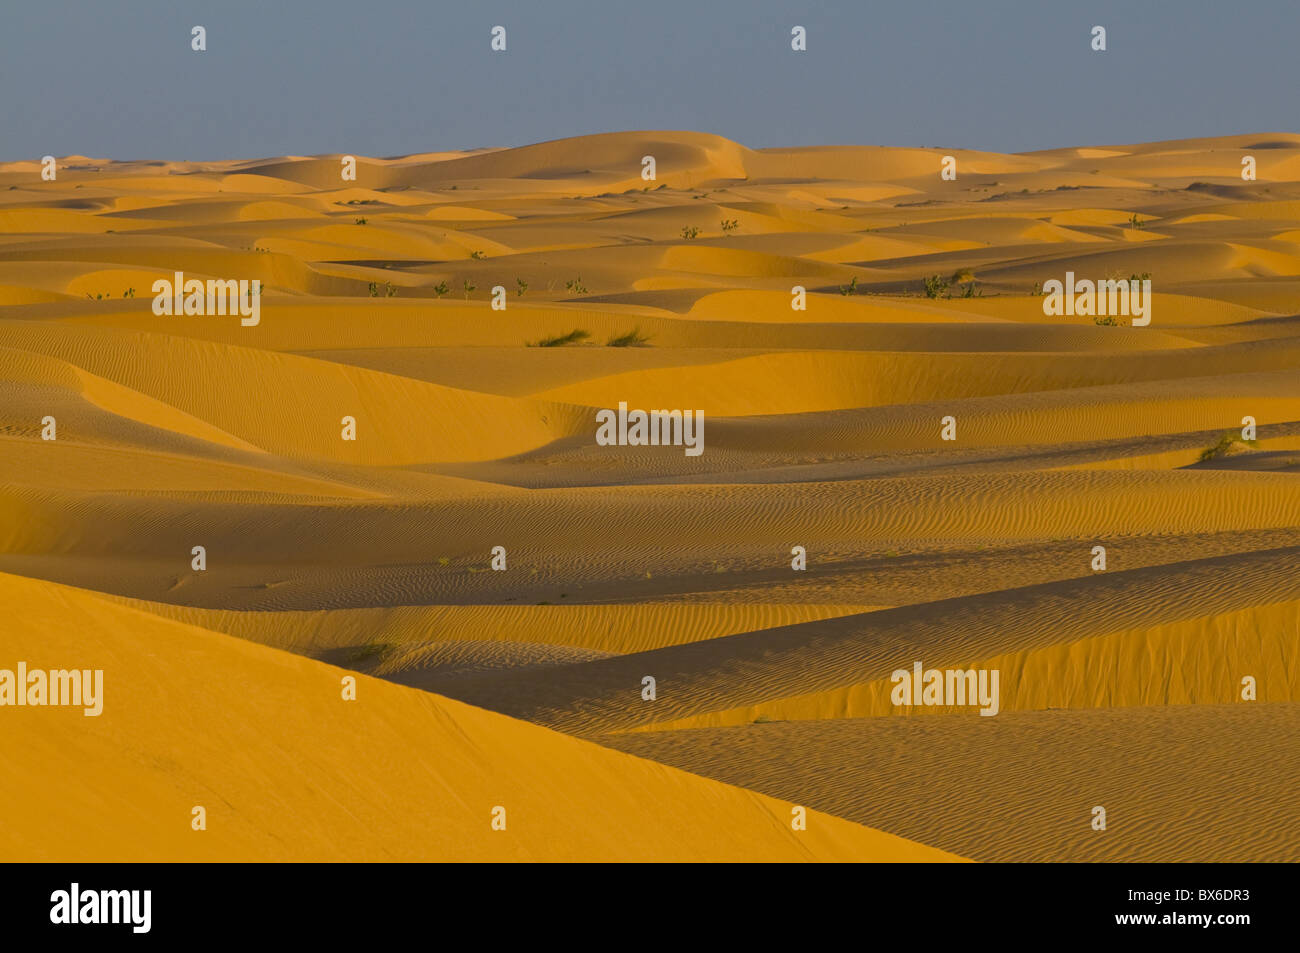 Sand dunes at sunset, near Chinguetti, Mauritania, Africa - Stock Image